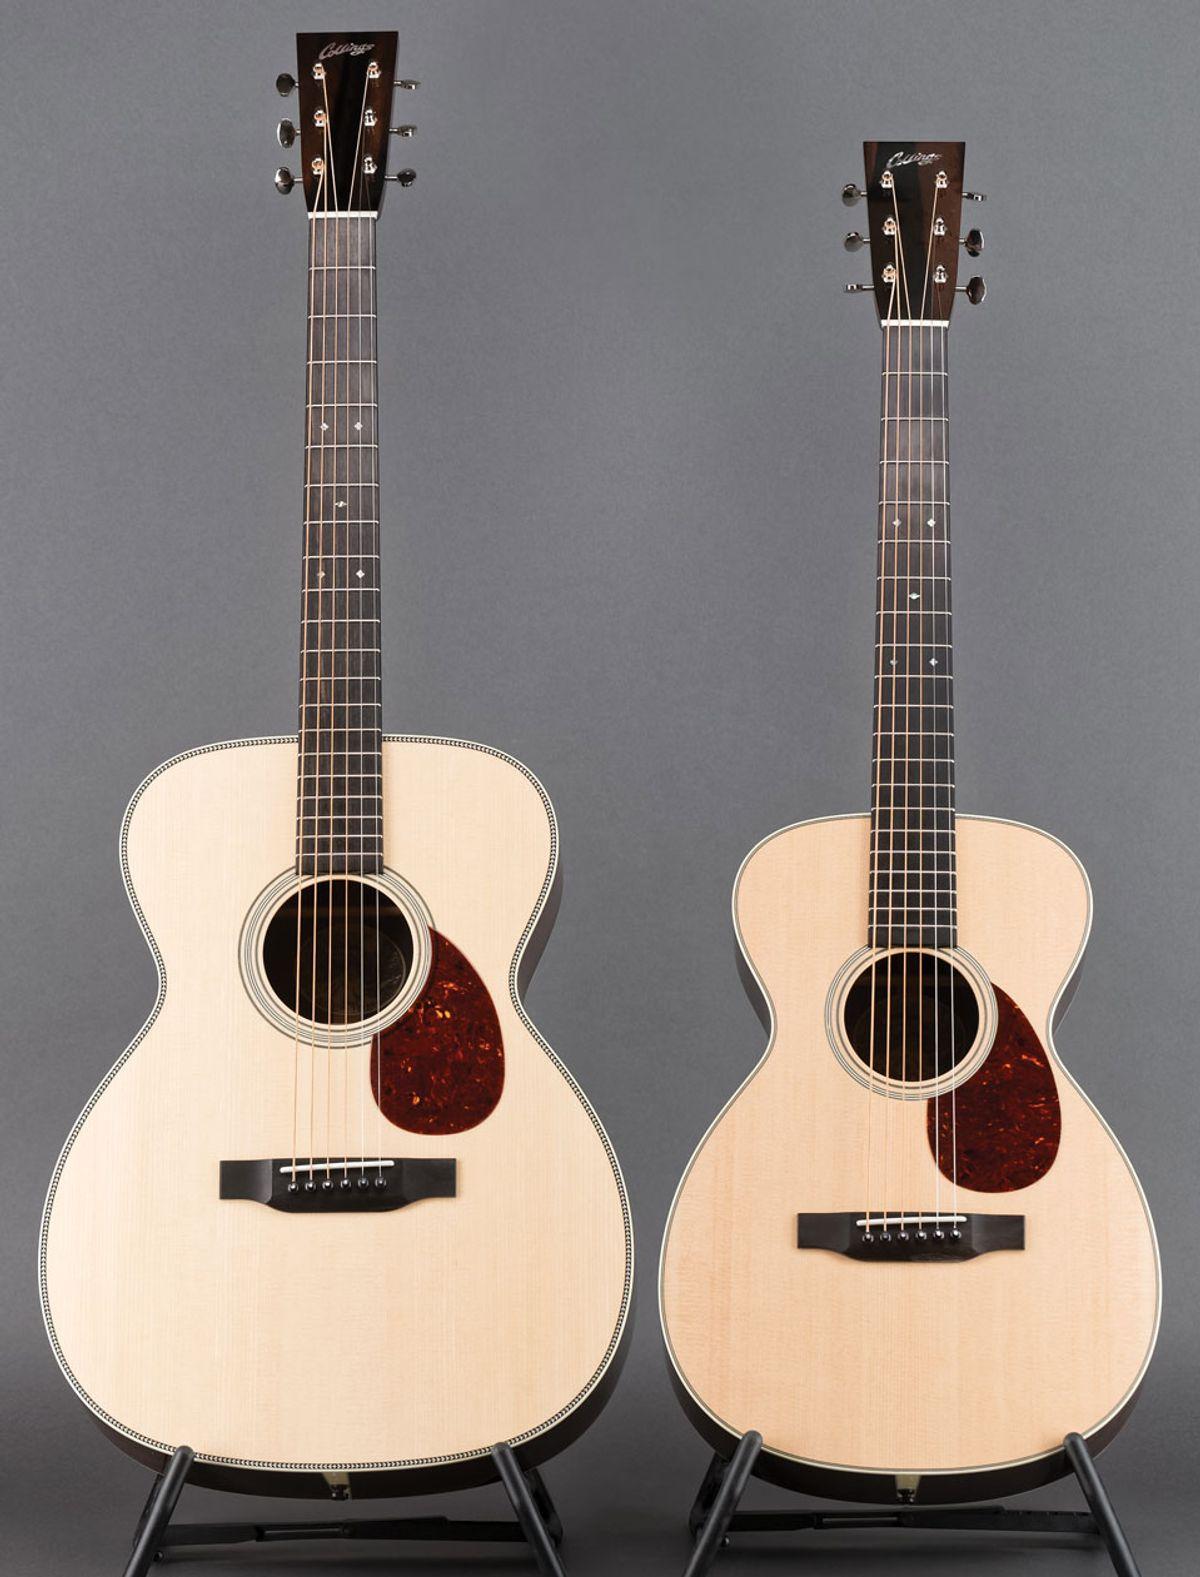 Acoustic Soundboard: Honey, I Shrunk the Guitar